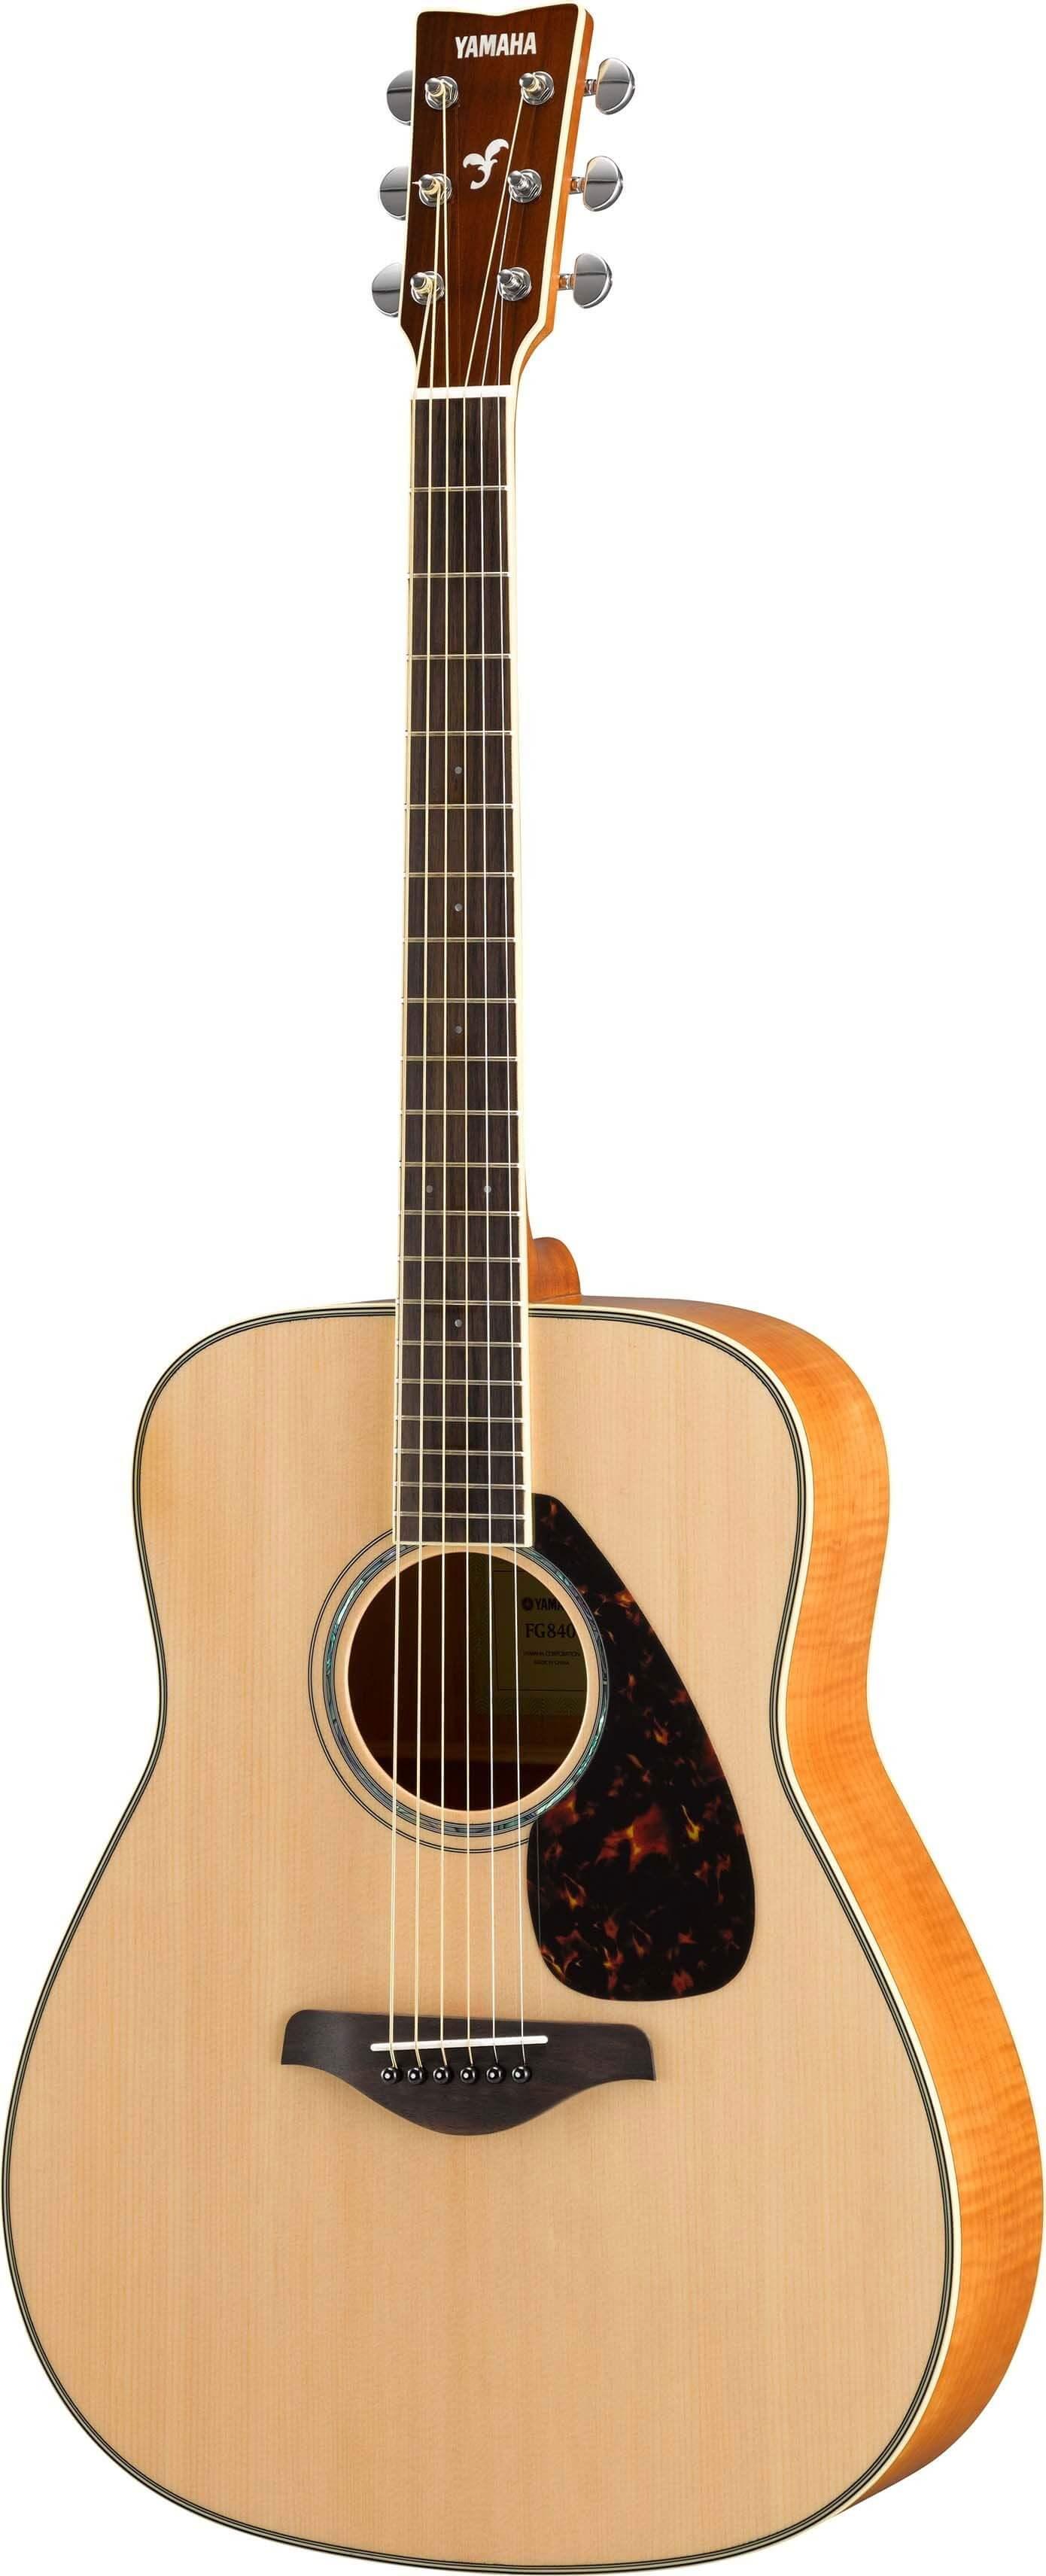 Guitarra Acústica Yamaha FG840 Natural